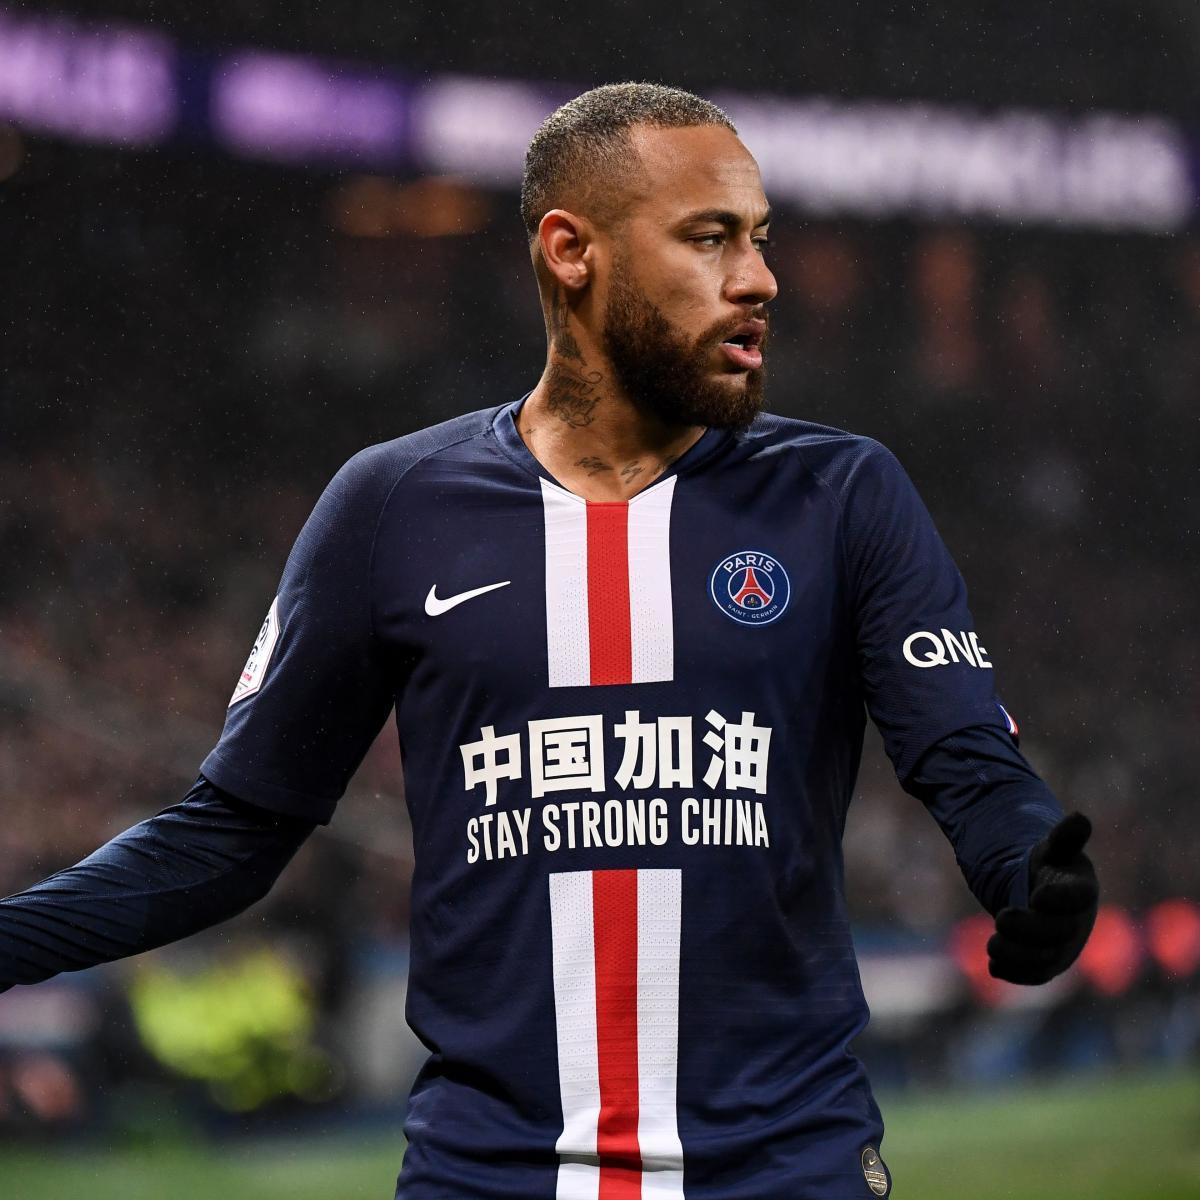 Neymar Sent Off Edinson Cavani Scores 200th Psg Goal In Win Vs Bordeaux Soccer Addict